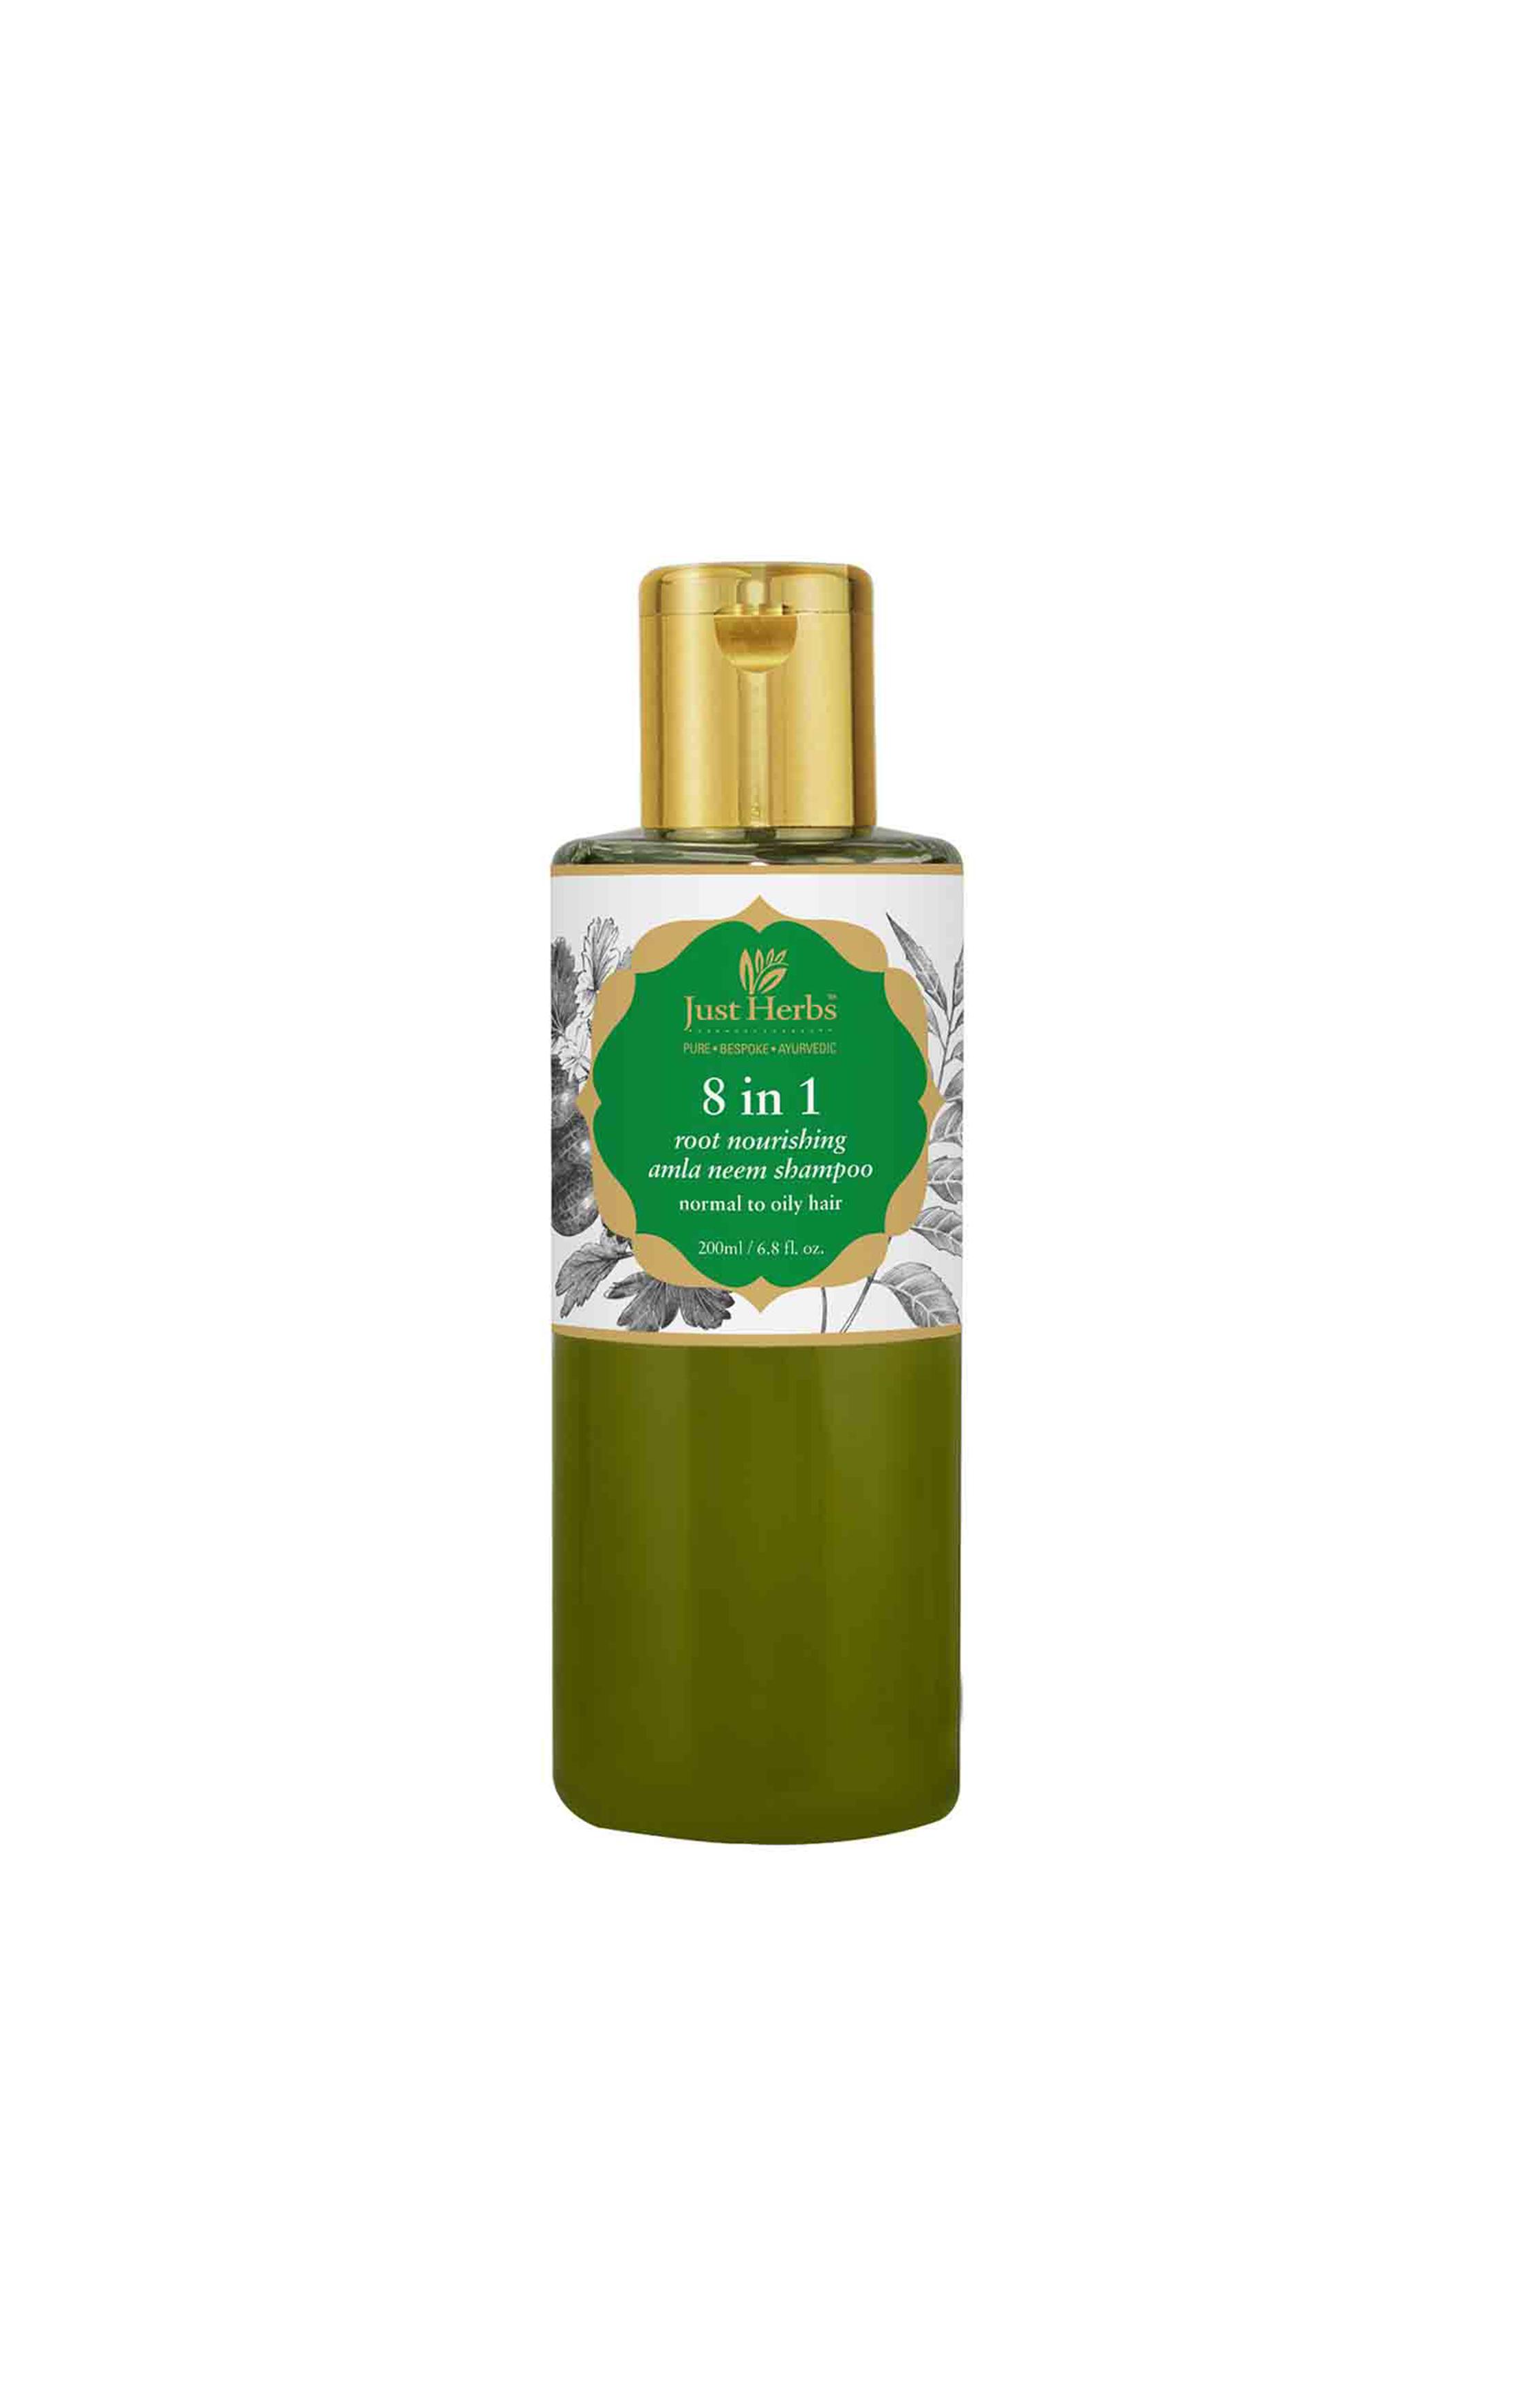 Just Herbs | 8 In 1 Root Nourishing Amla Neem Shampoo